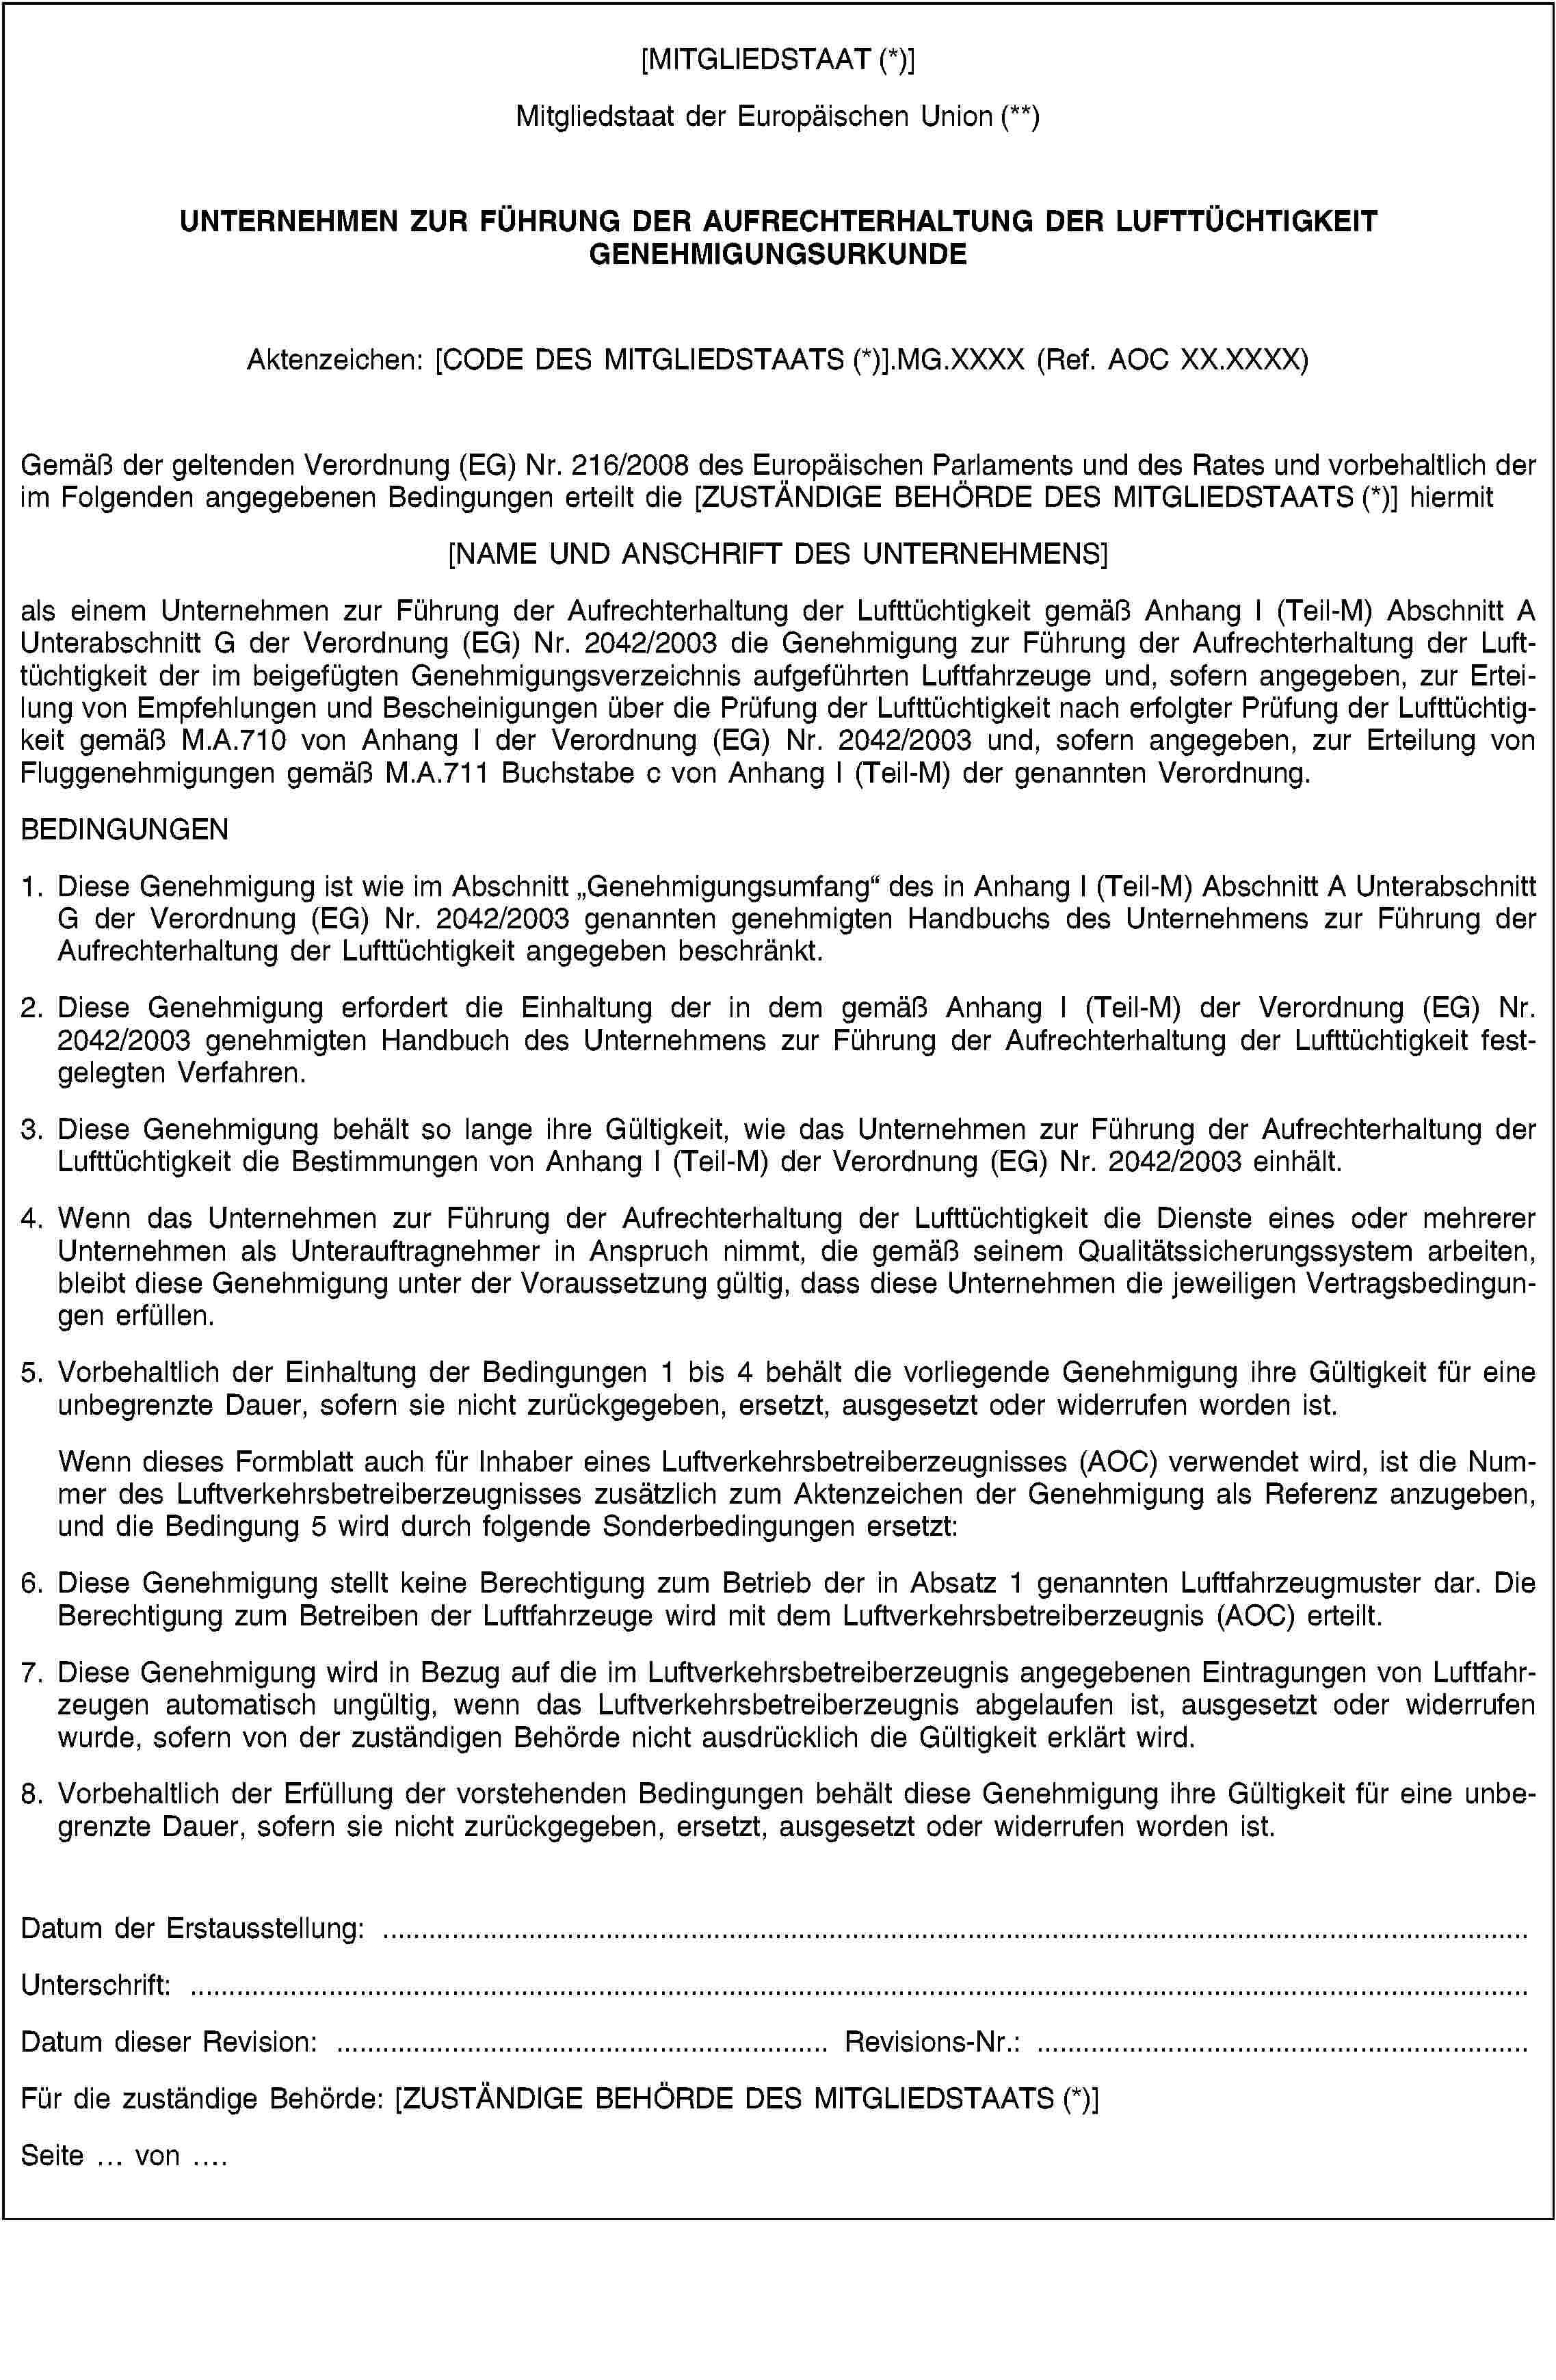 EUR-Lex - 02003R2042-20101028 - EN - EUR-Lex